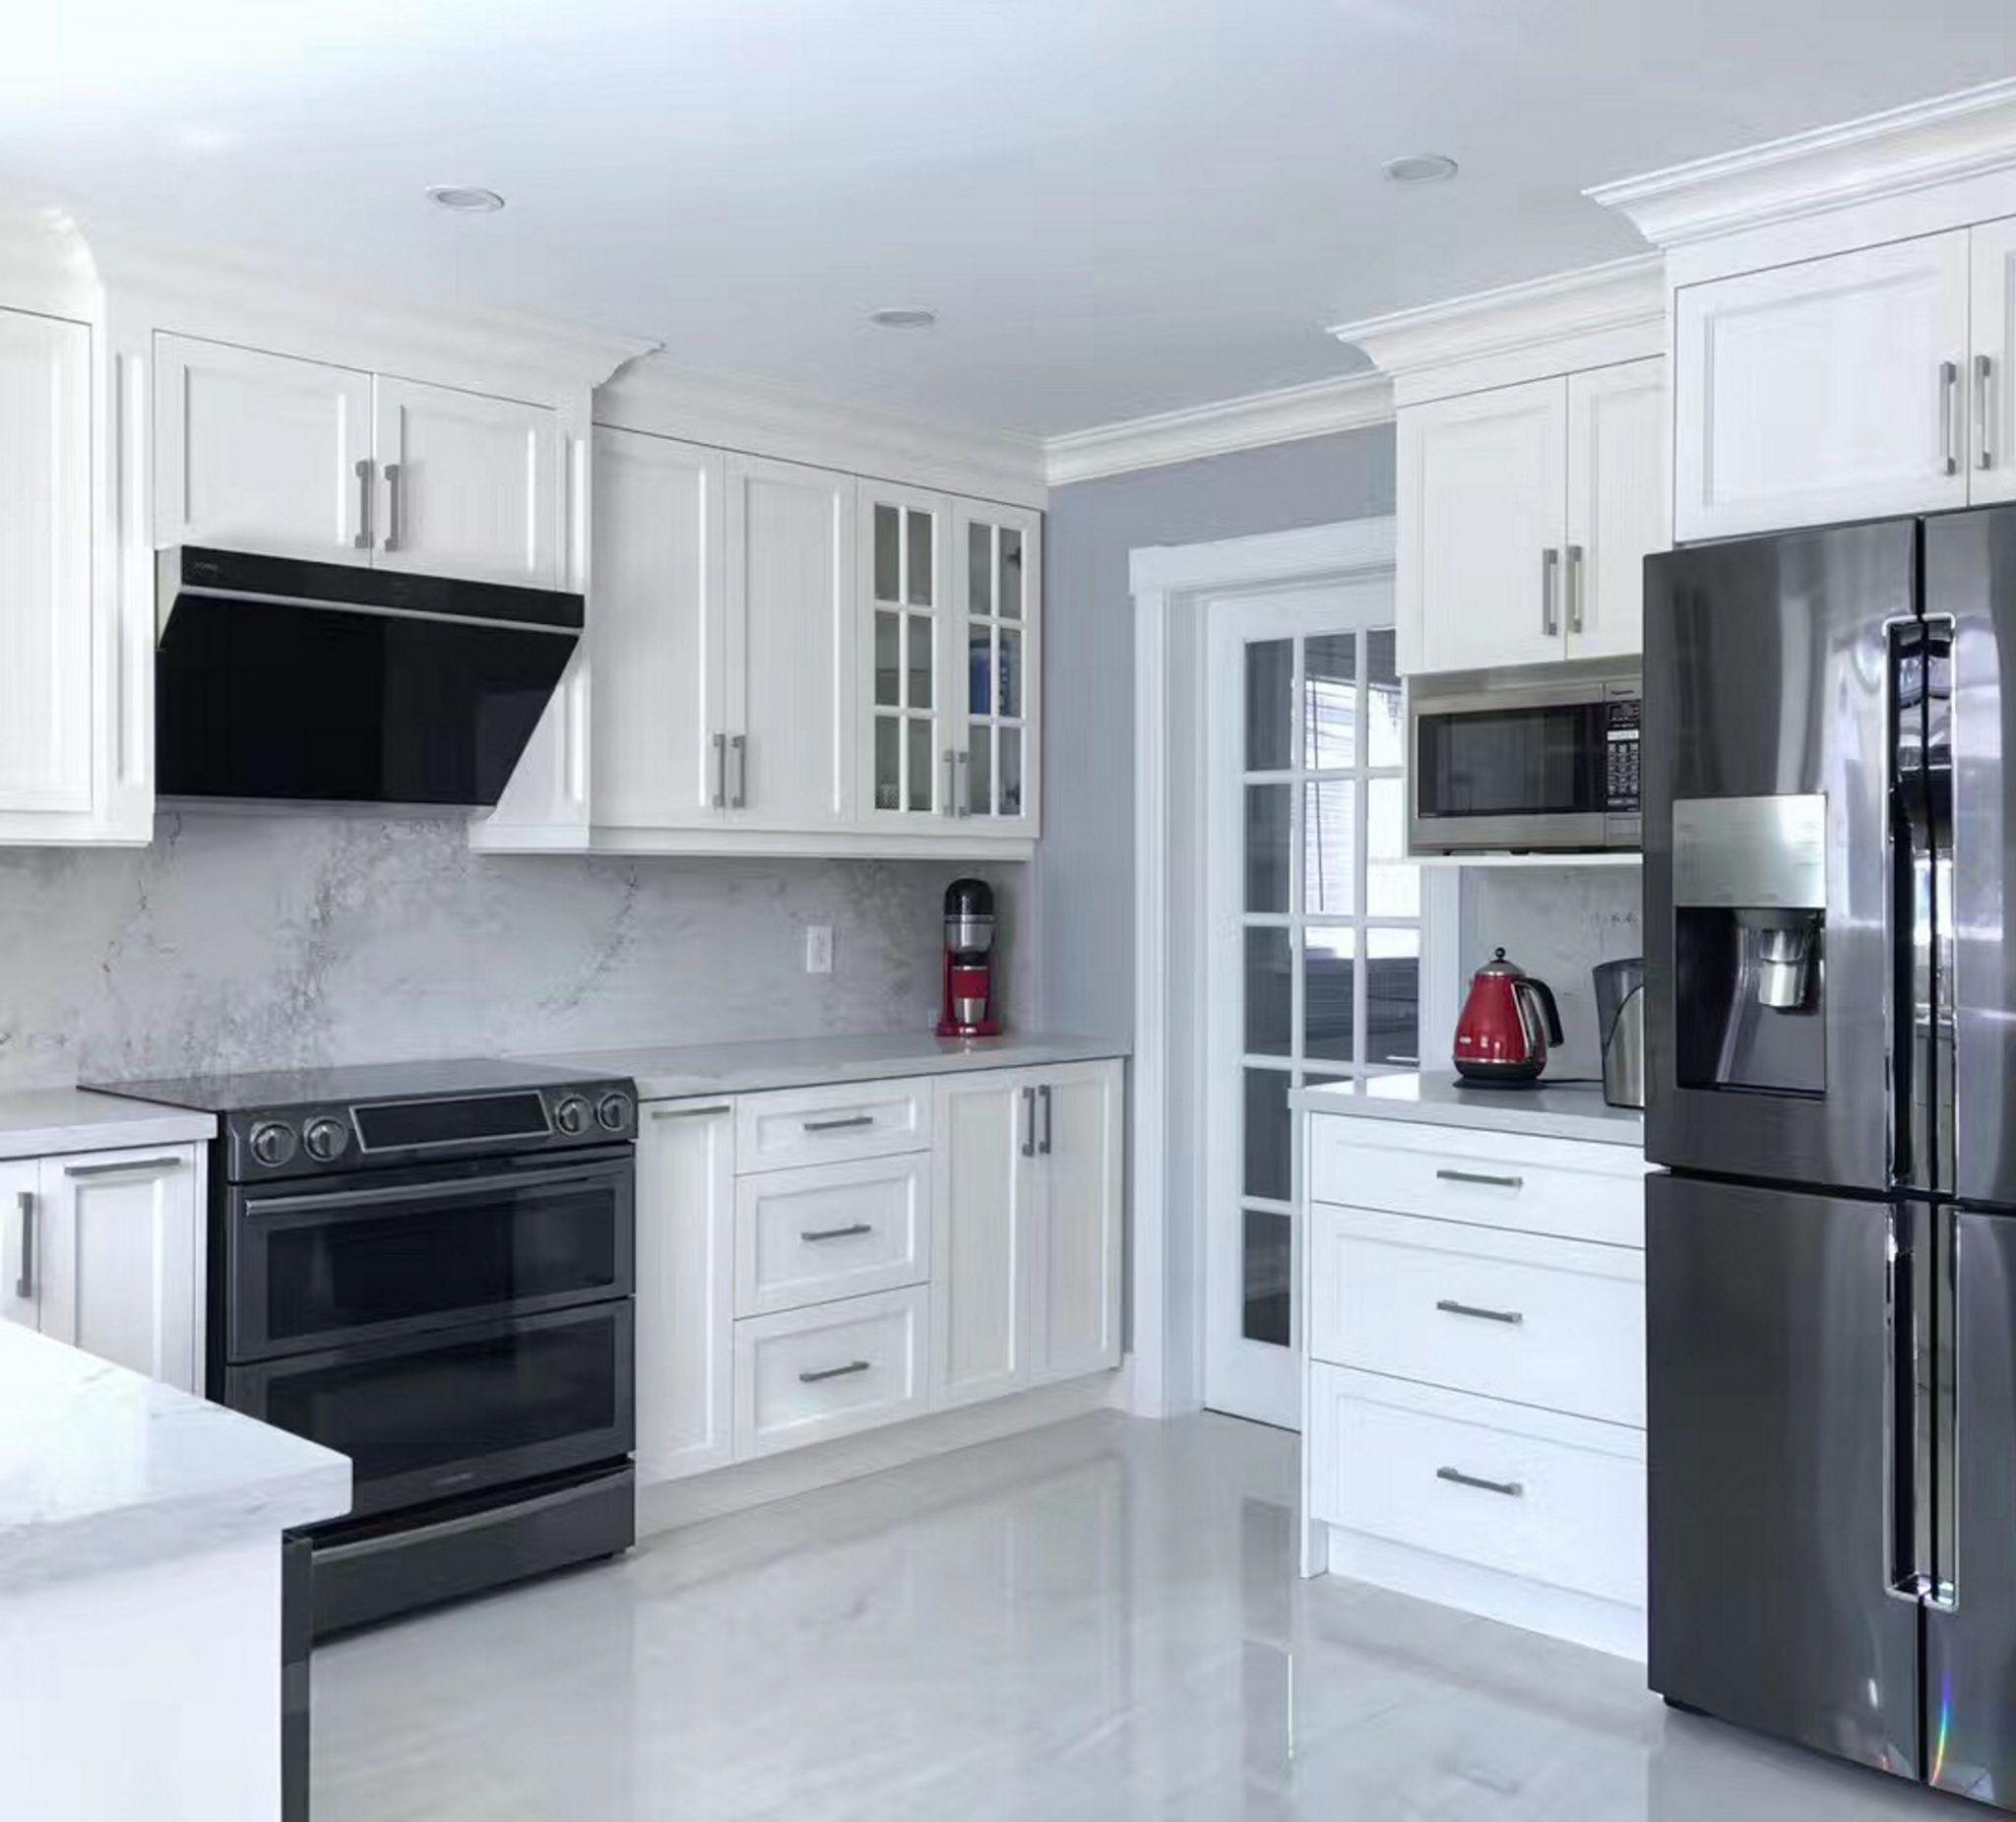 Jqg7501 Lifestyle2 Range Hood Kitchen Remodel Installing Cabinets